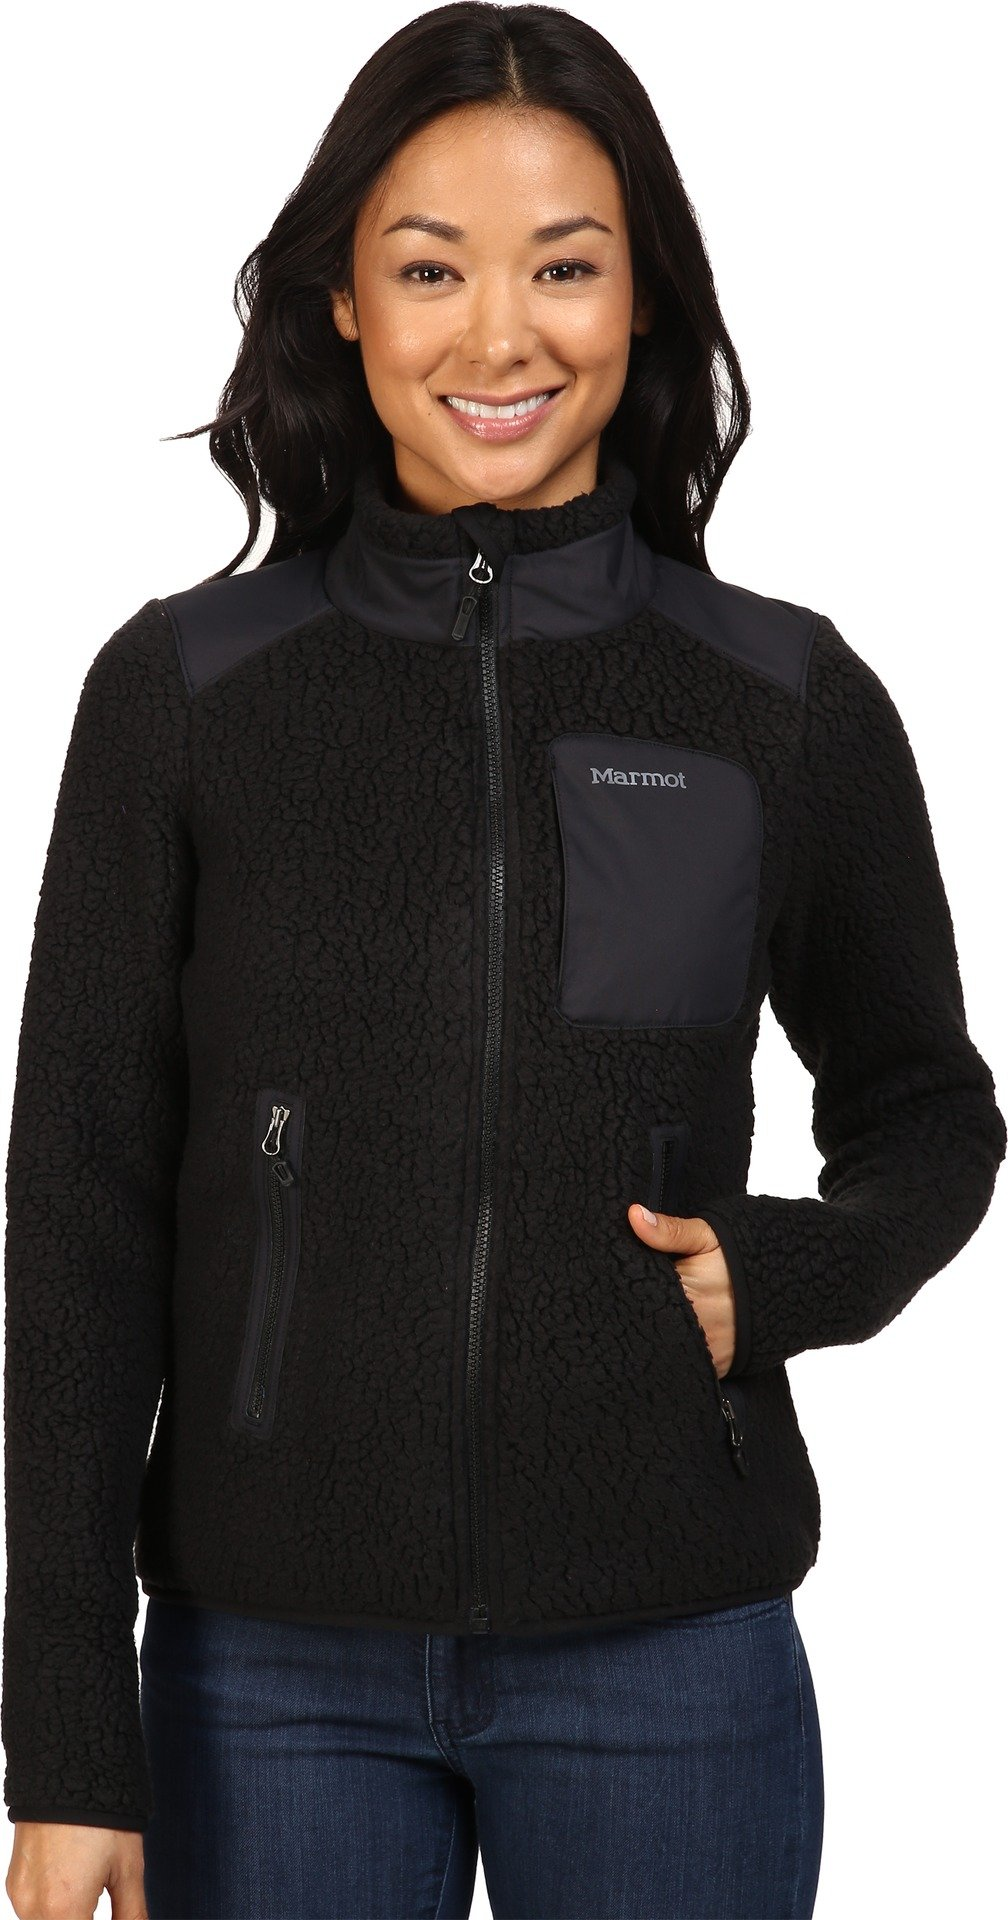 Marmot Women's Wiley Jacket Black Large